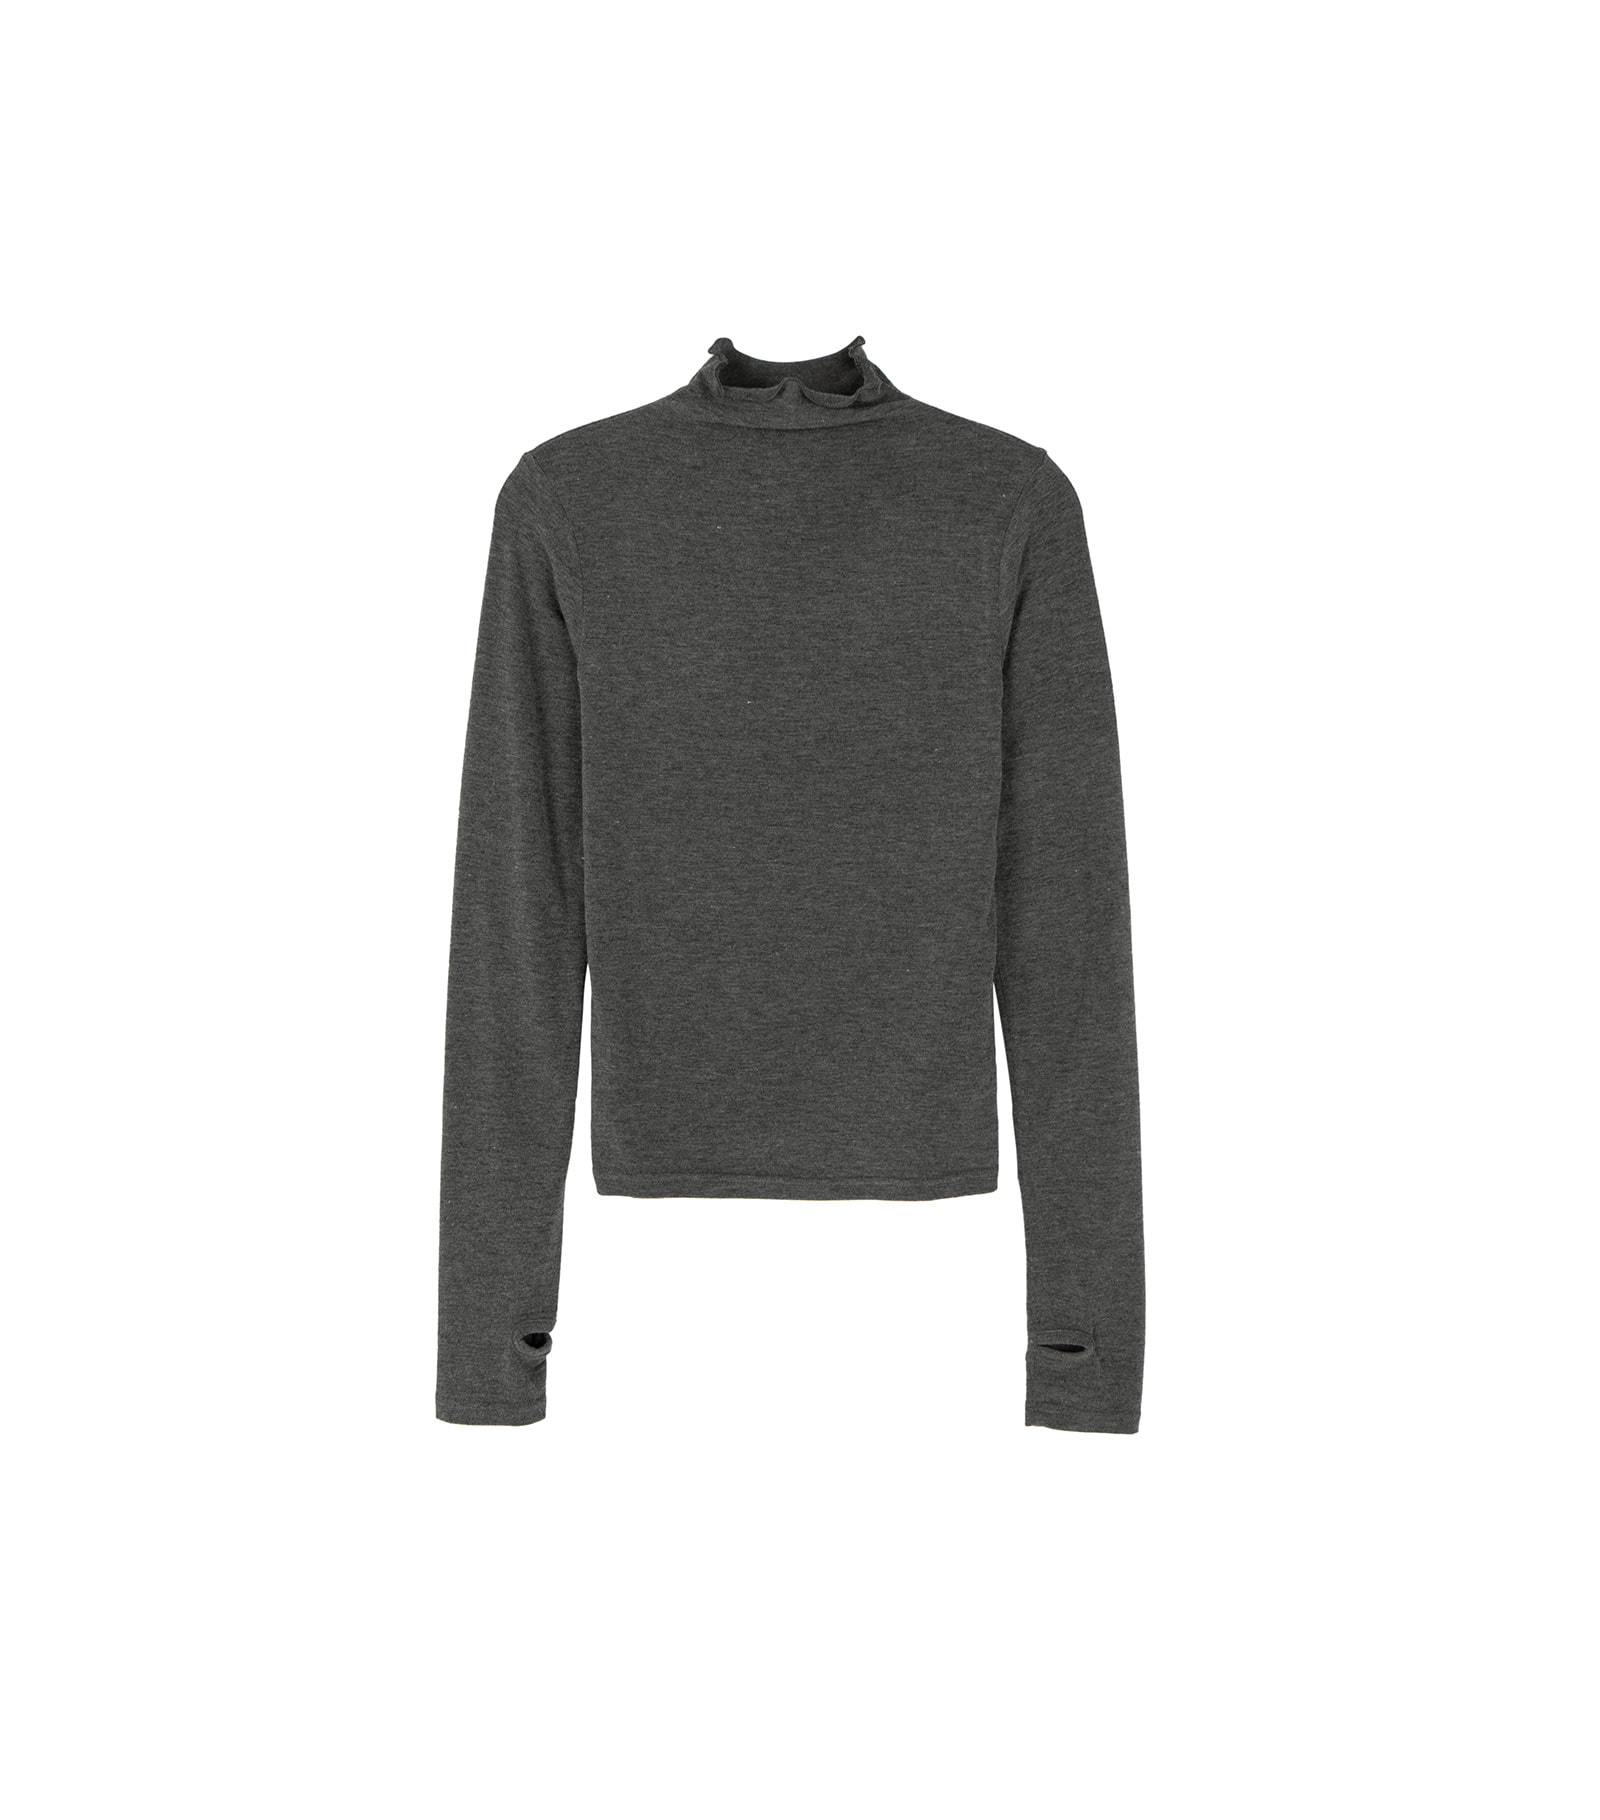 Troy warmer turtleneck casual top